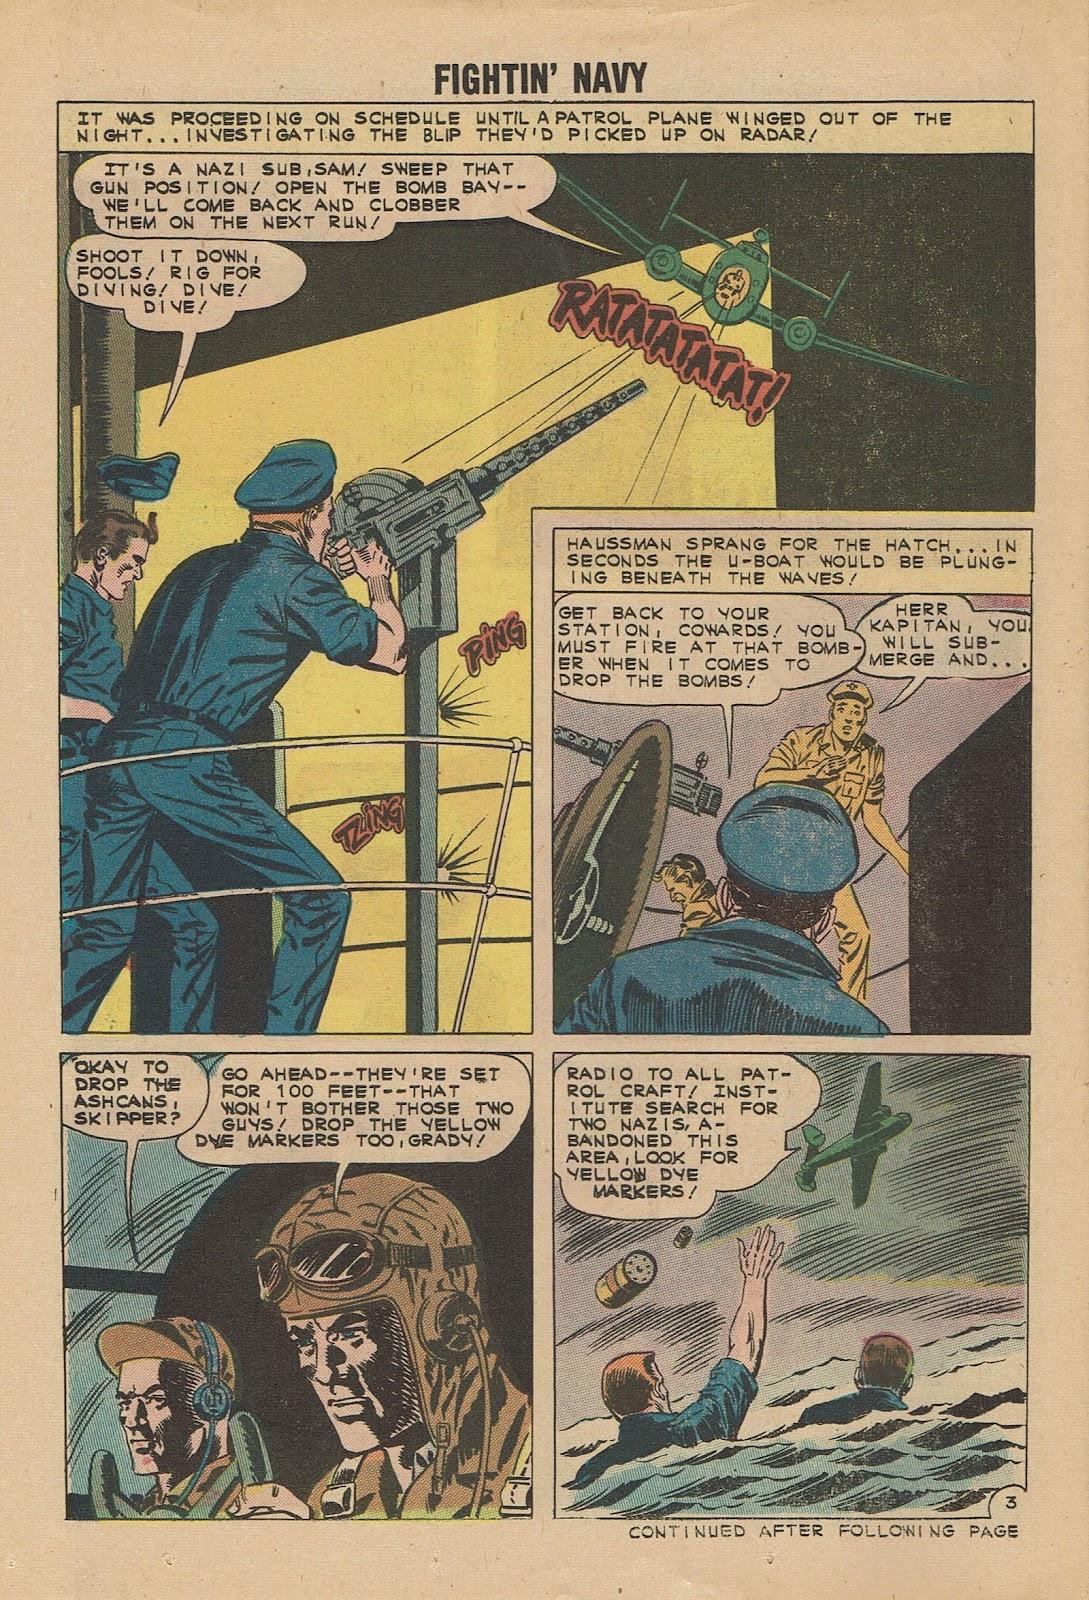 Read online Fightin' Navy comic -  Issue #101 - 14